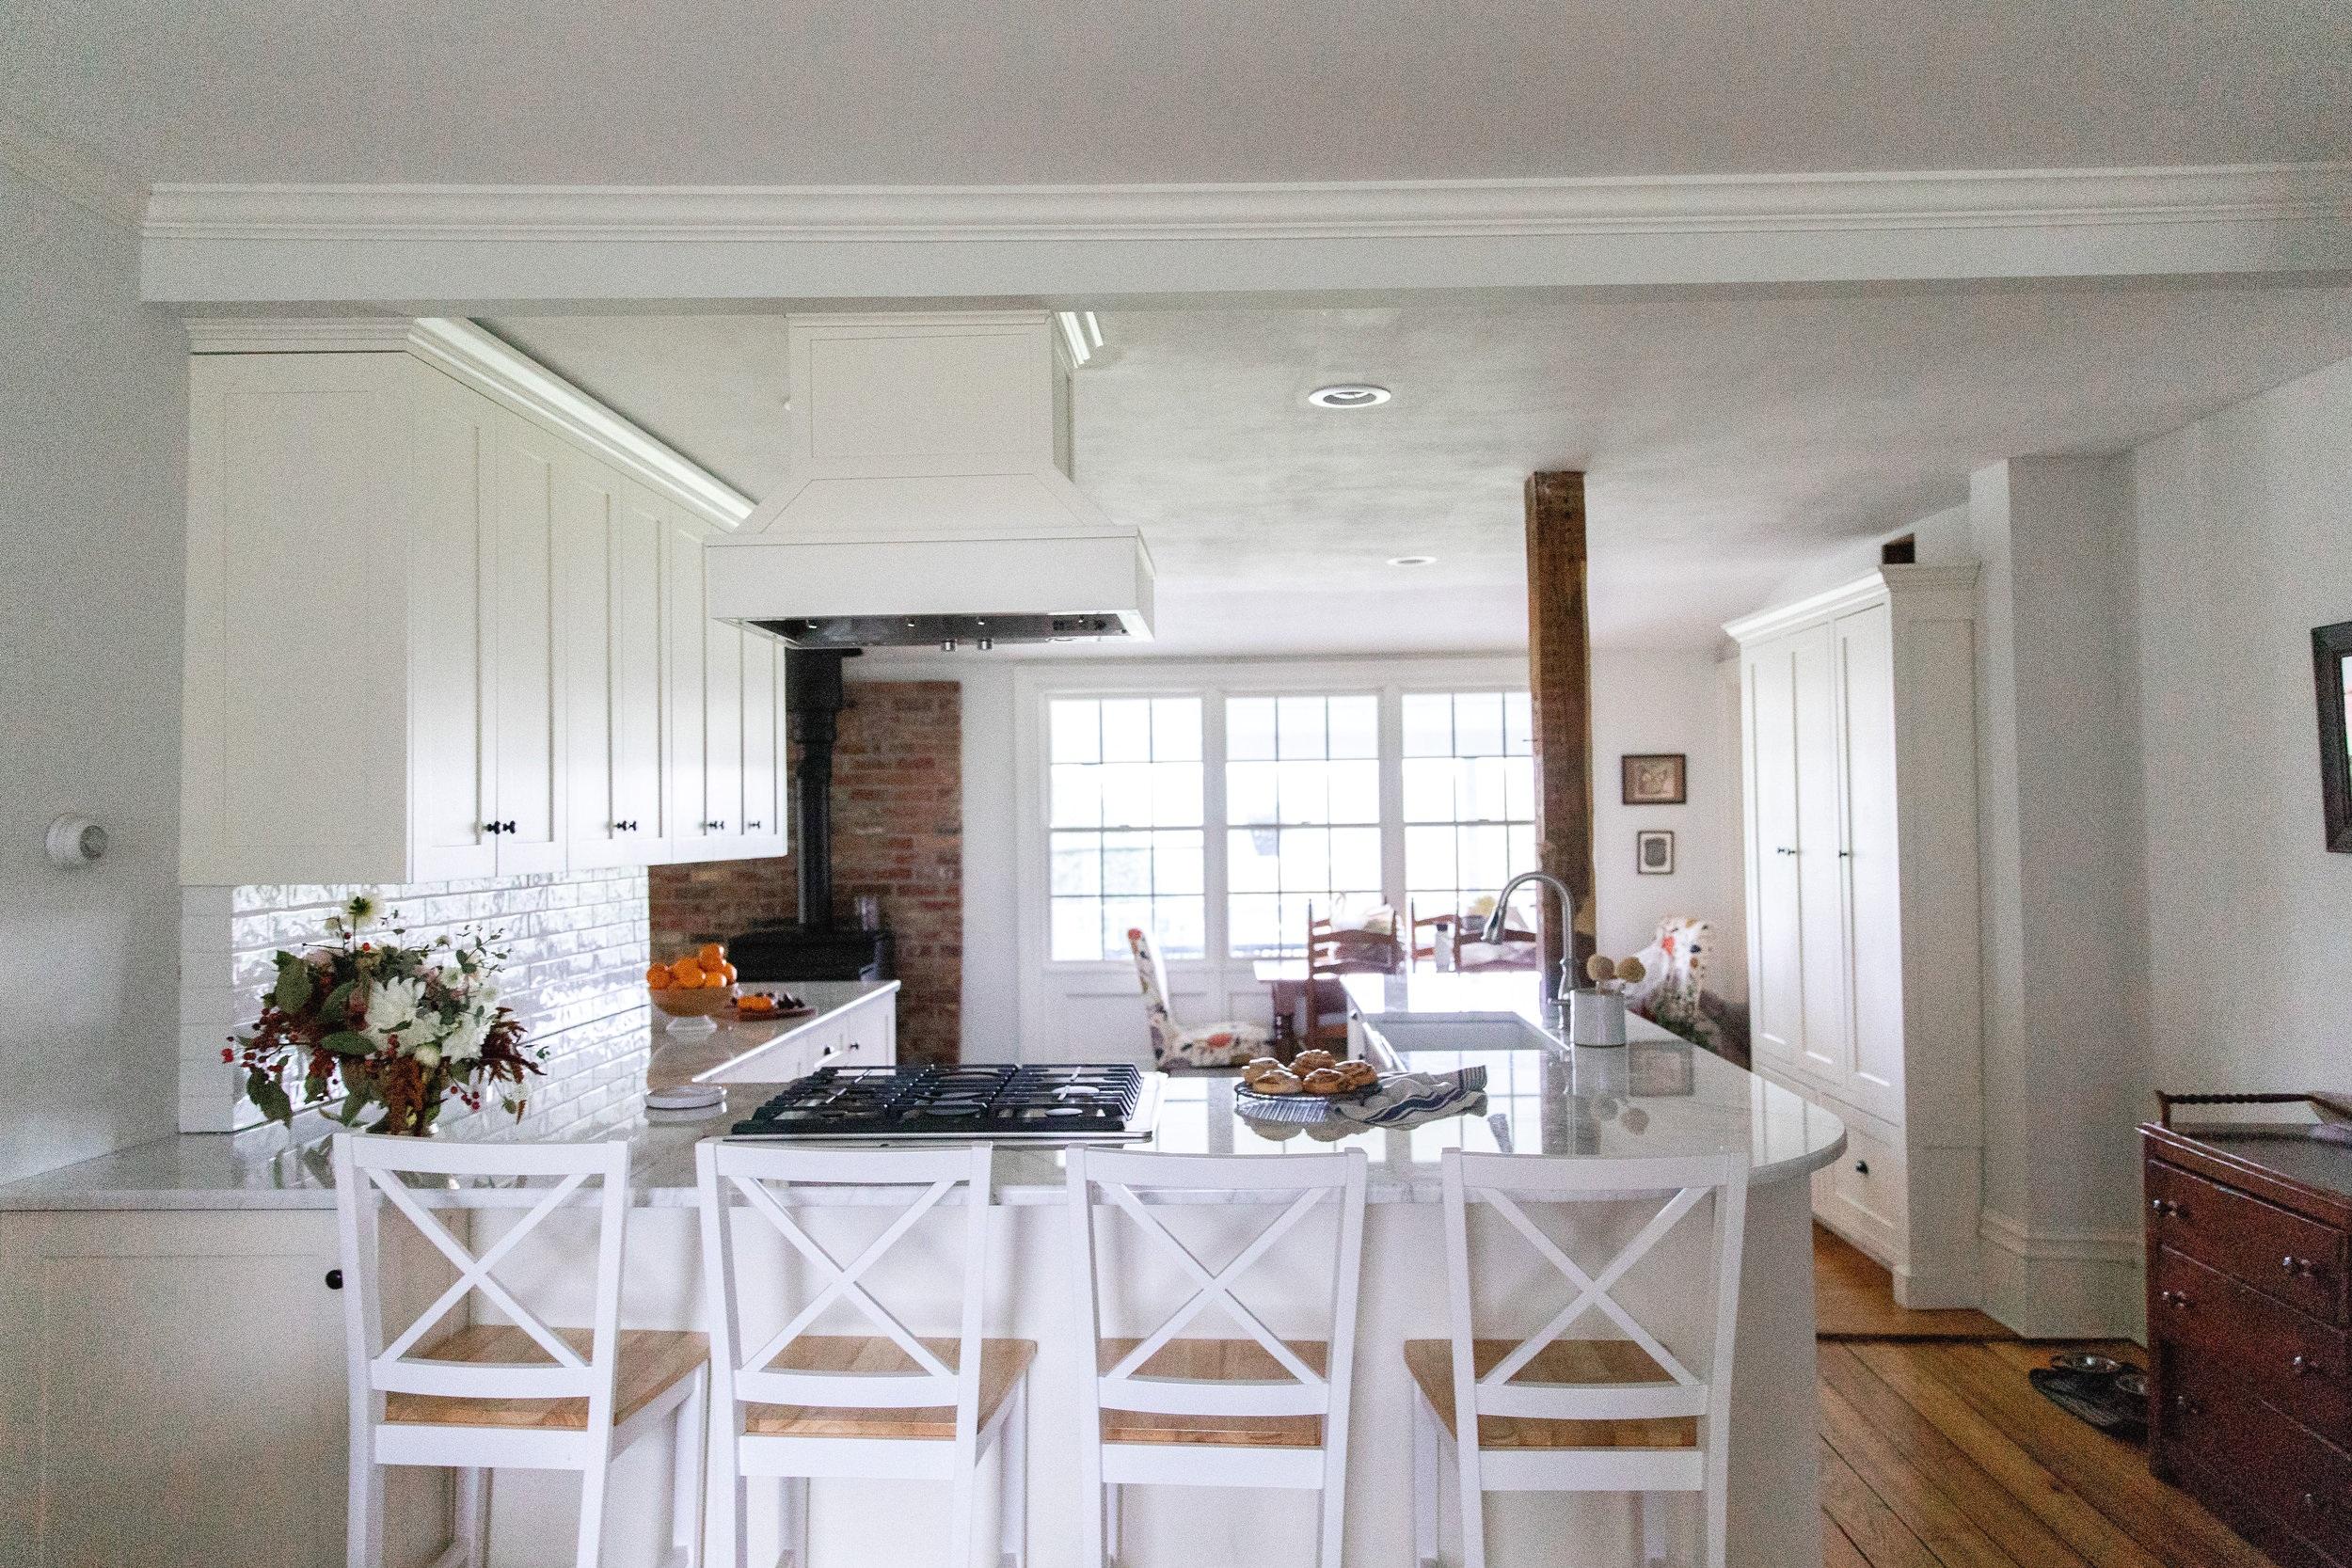 Small u-shaped kitchen remodel ideas, Skaneateles, NY interior designer